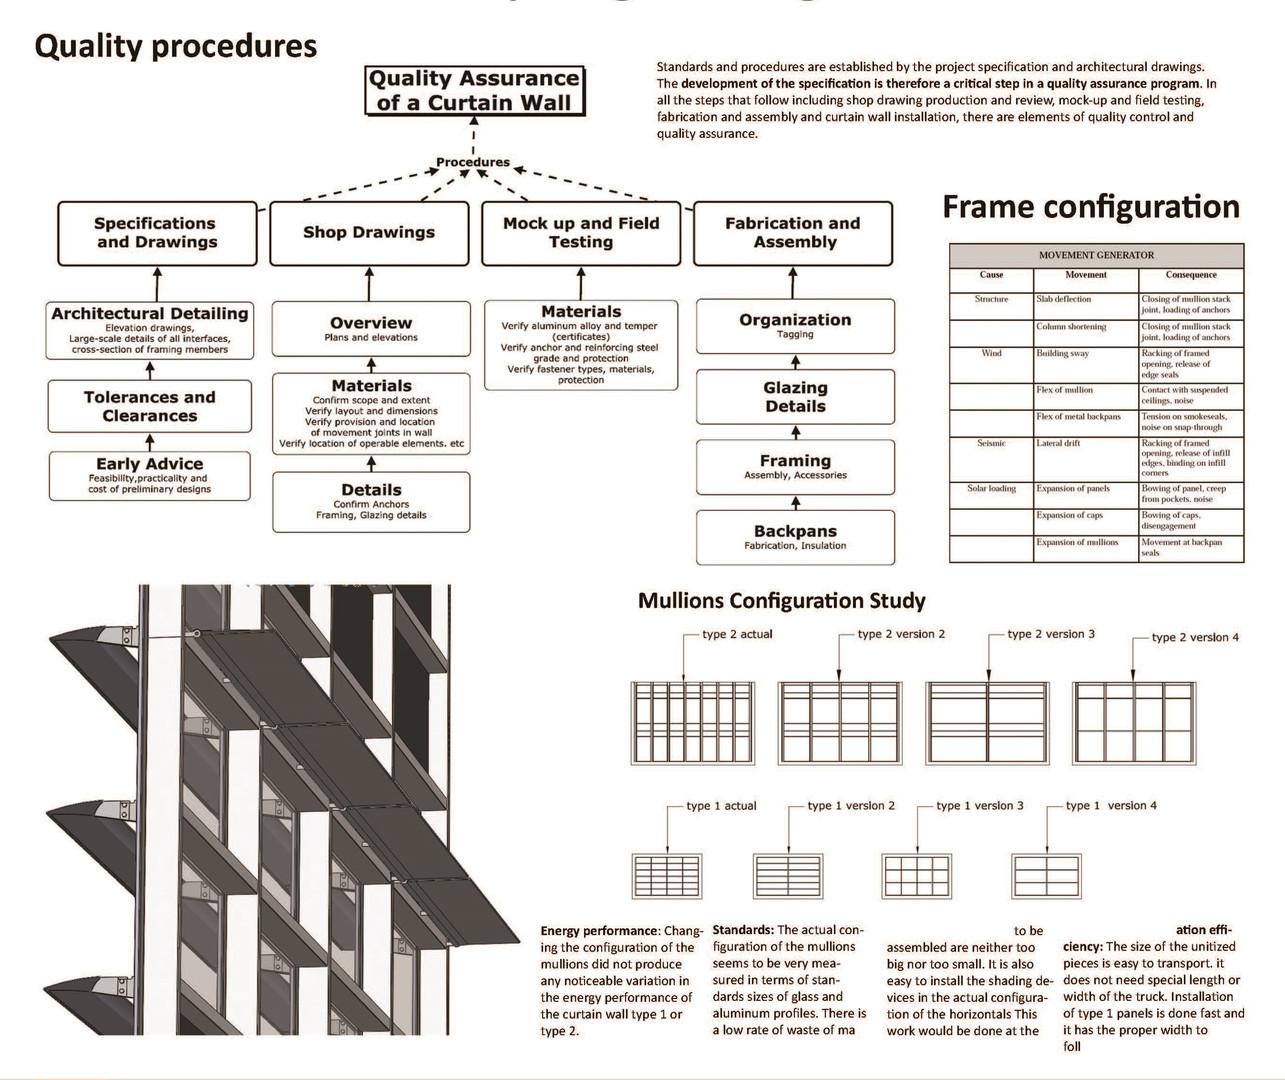 FacadeStructureAnalysis_4.jpg